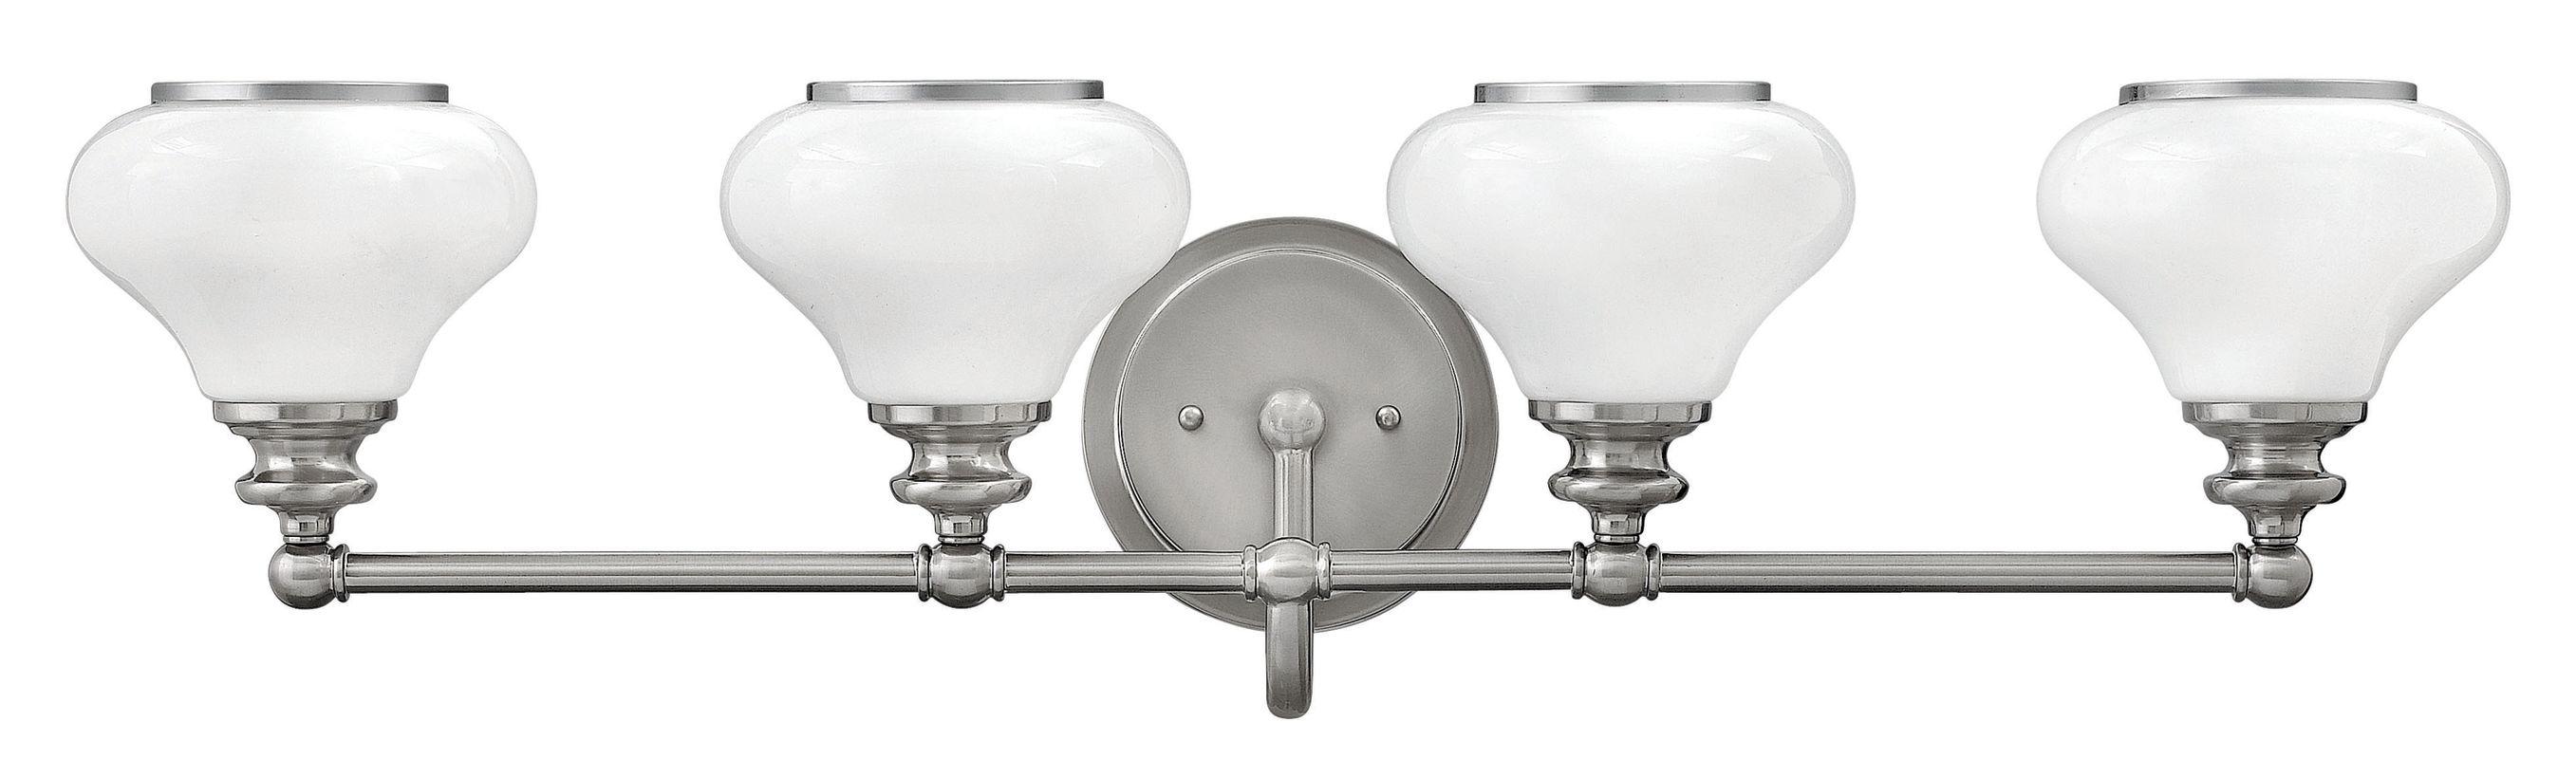 Hinkley Lighting 56554 4 Light Bathroom Vanity Light with Frosted Sale $309.00 ITEM: bci2635596 ID#:56554BN UPC: 640665565539 :